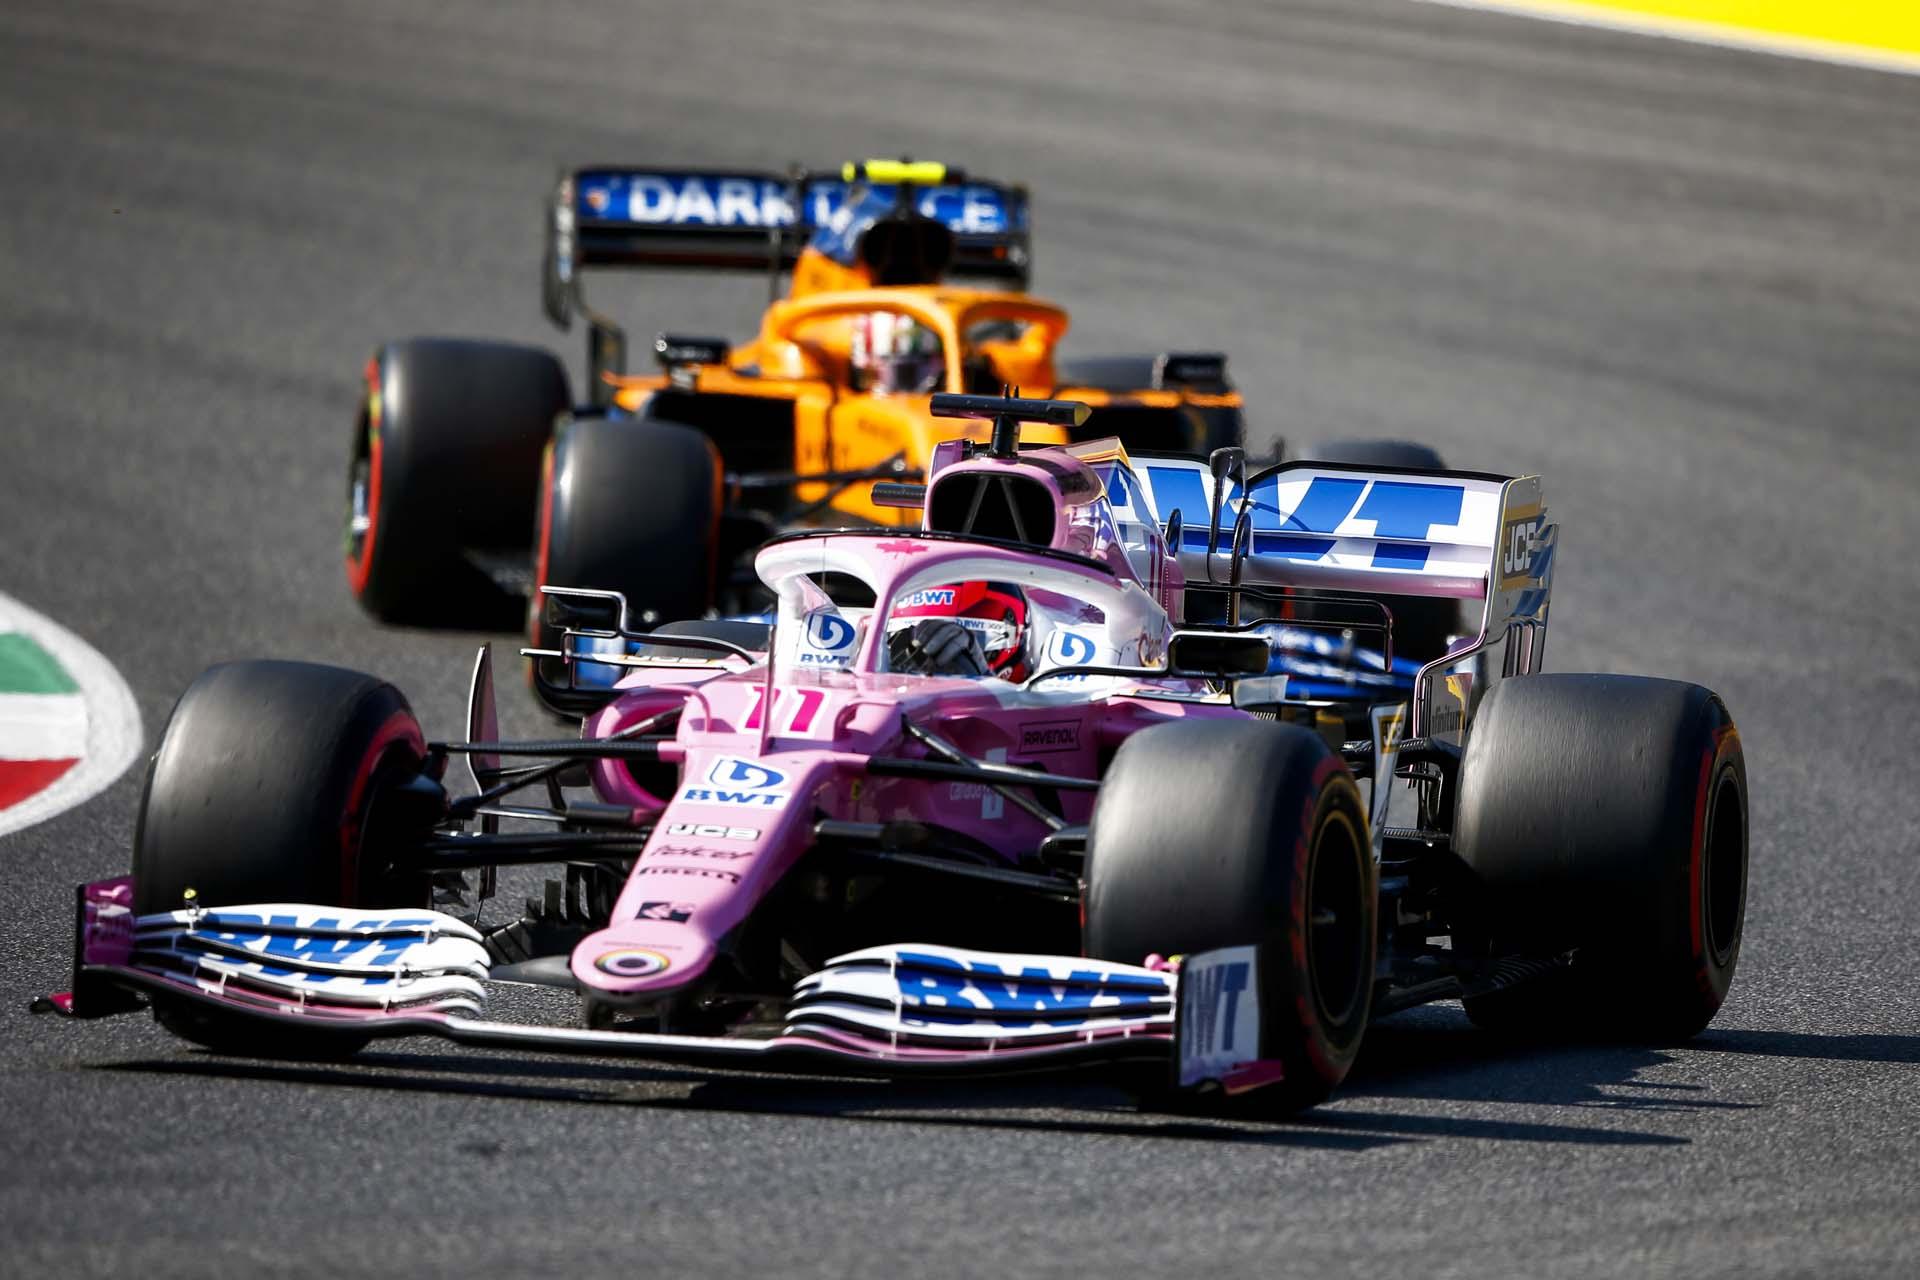 Sergio Perez, Racing Point RP20, leads Lando Norris, McLaren MCL35